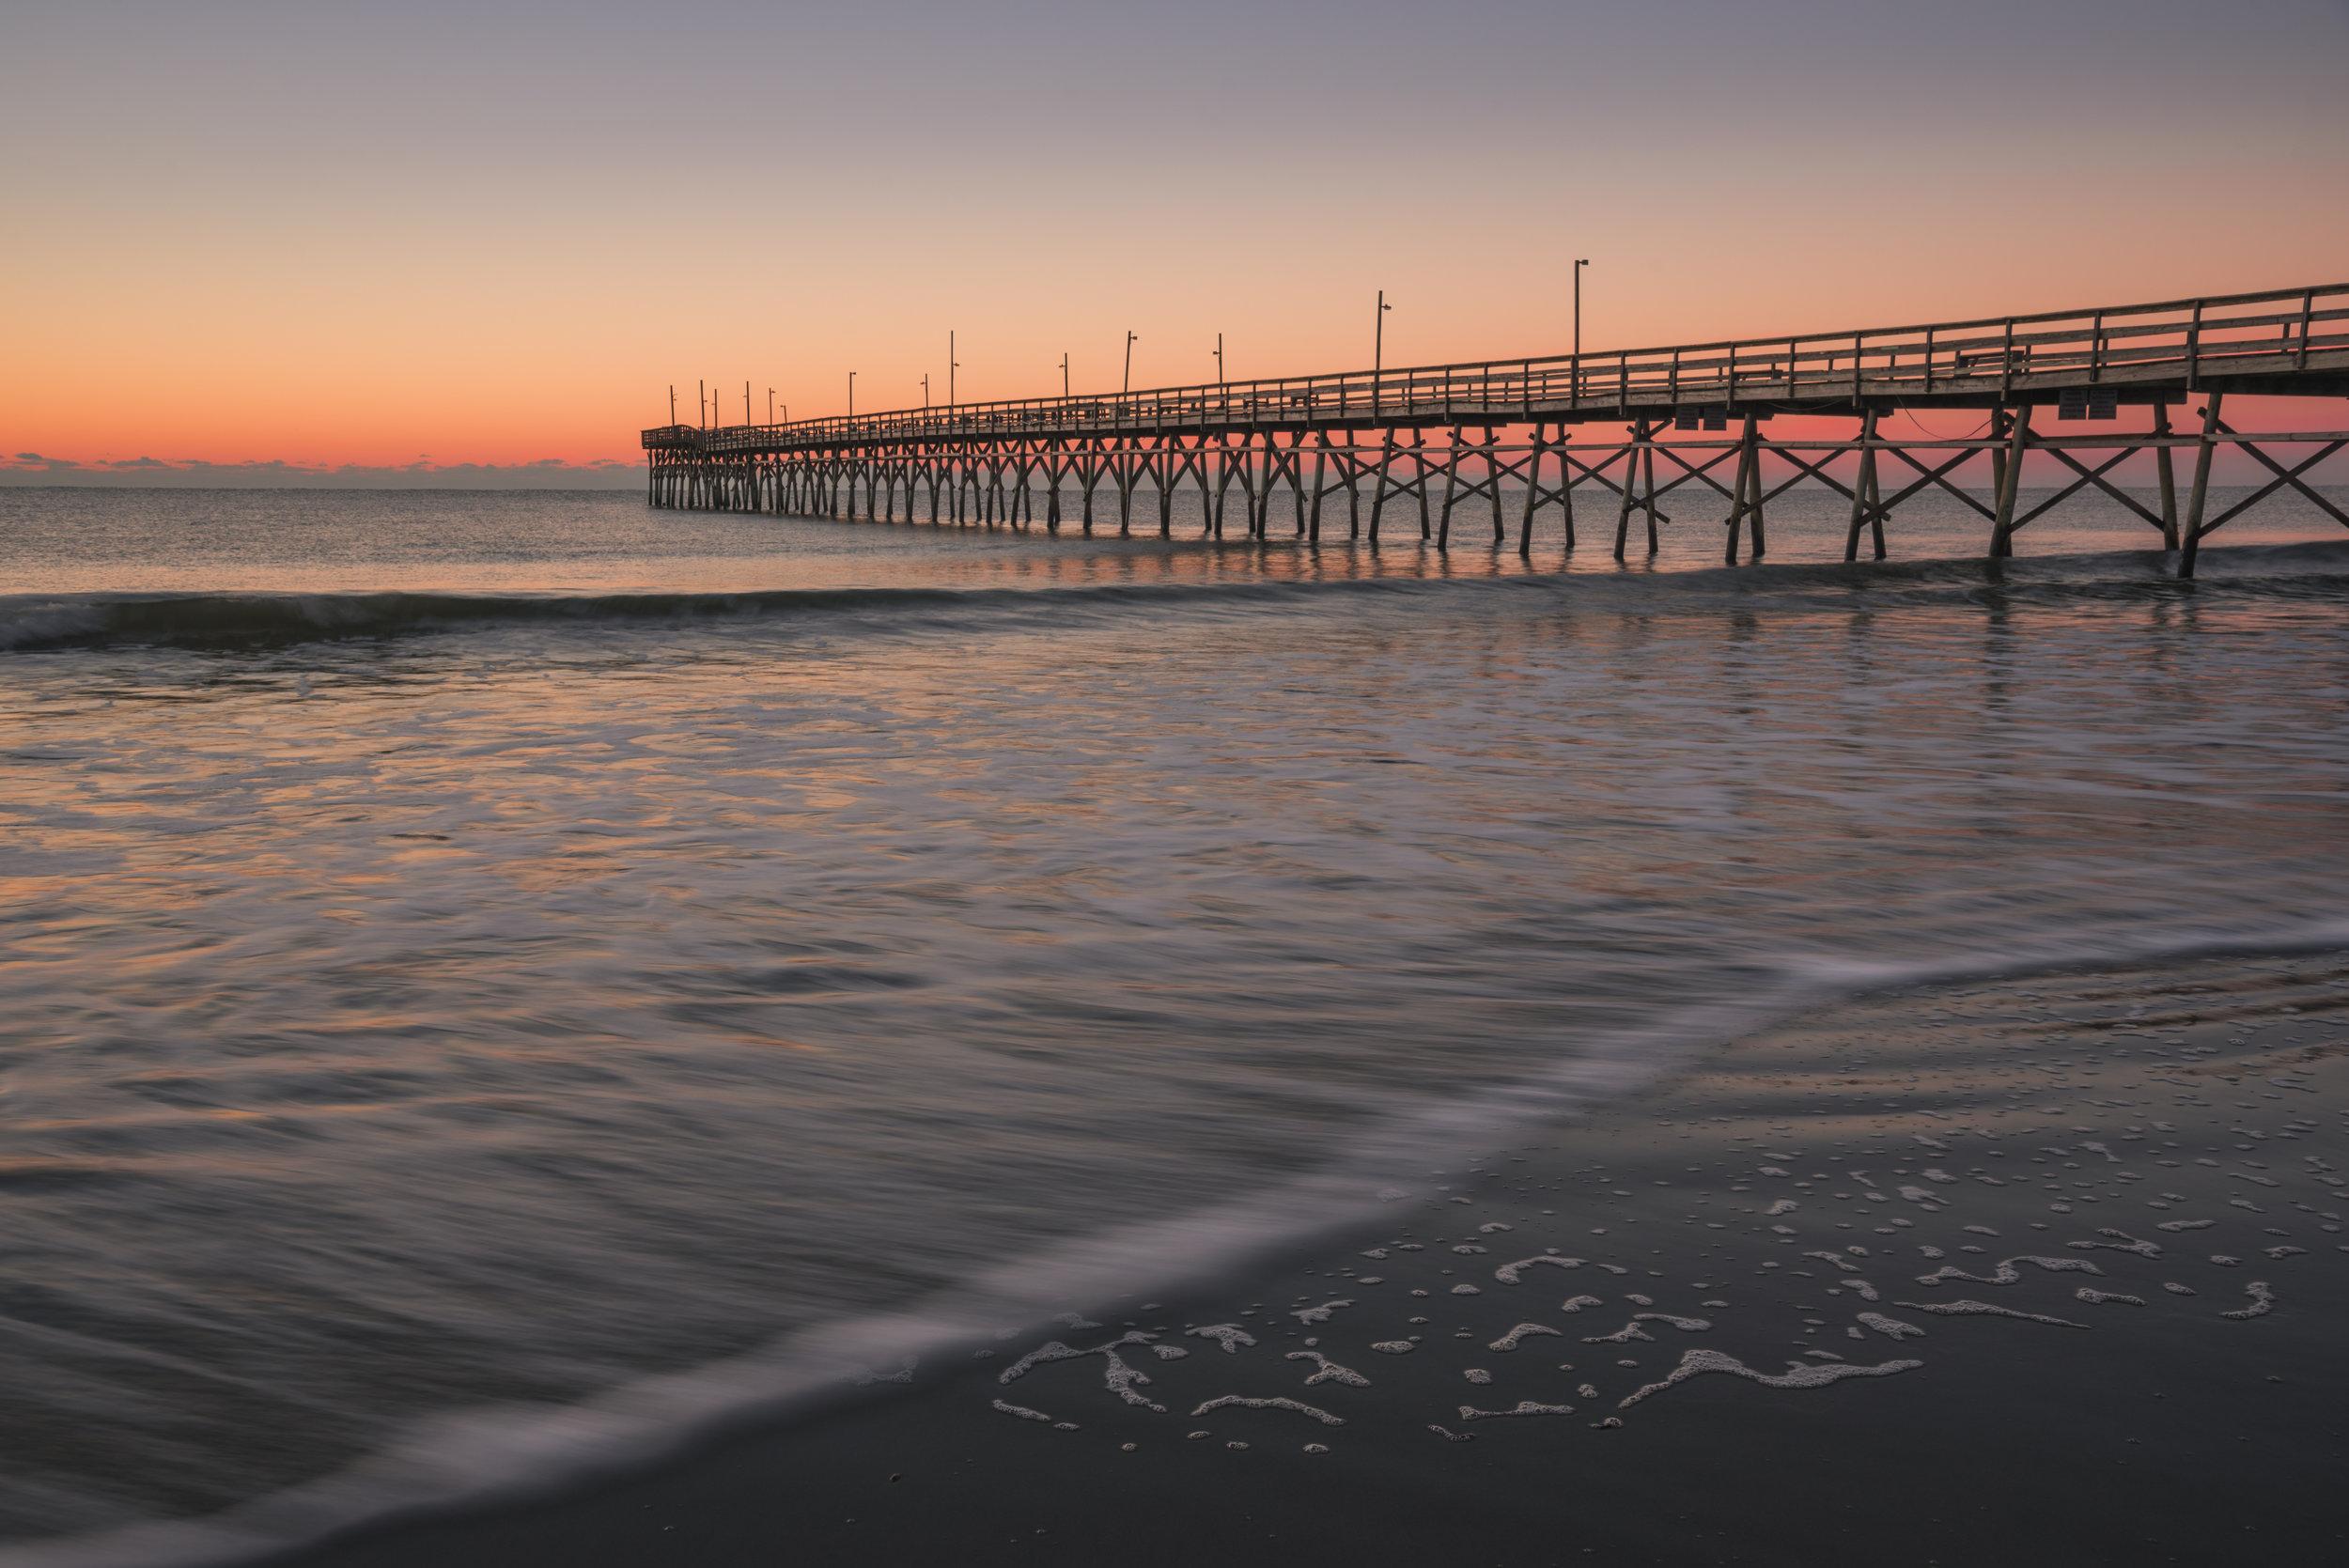 Sunrise, Sunset Beach, North Carolina